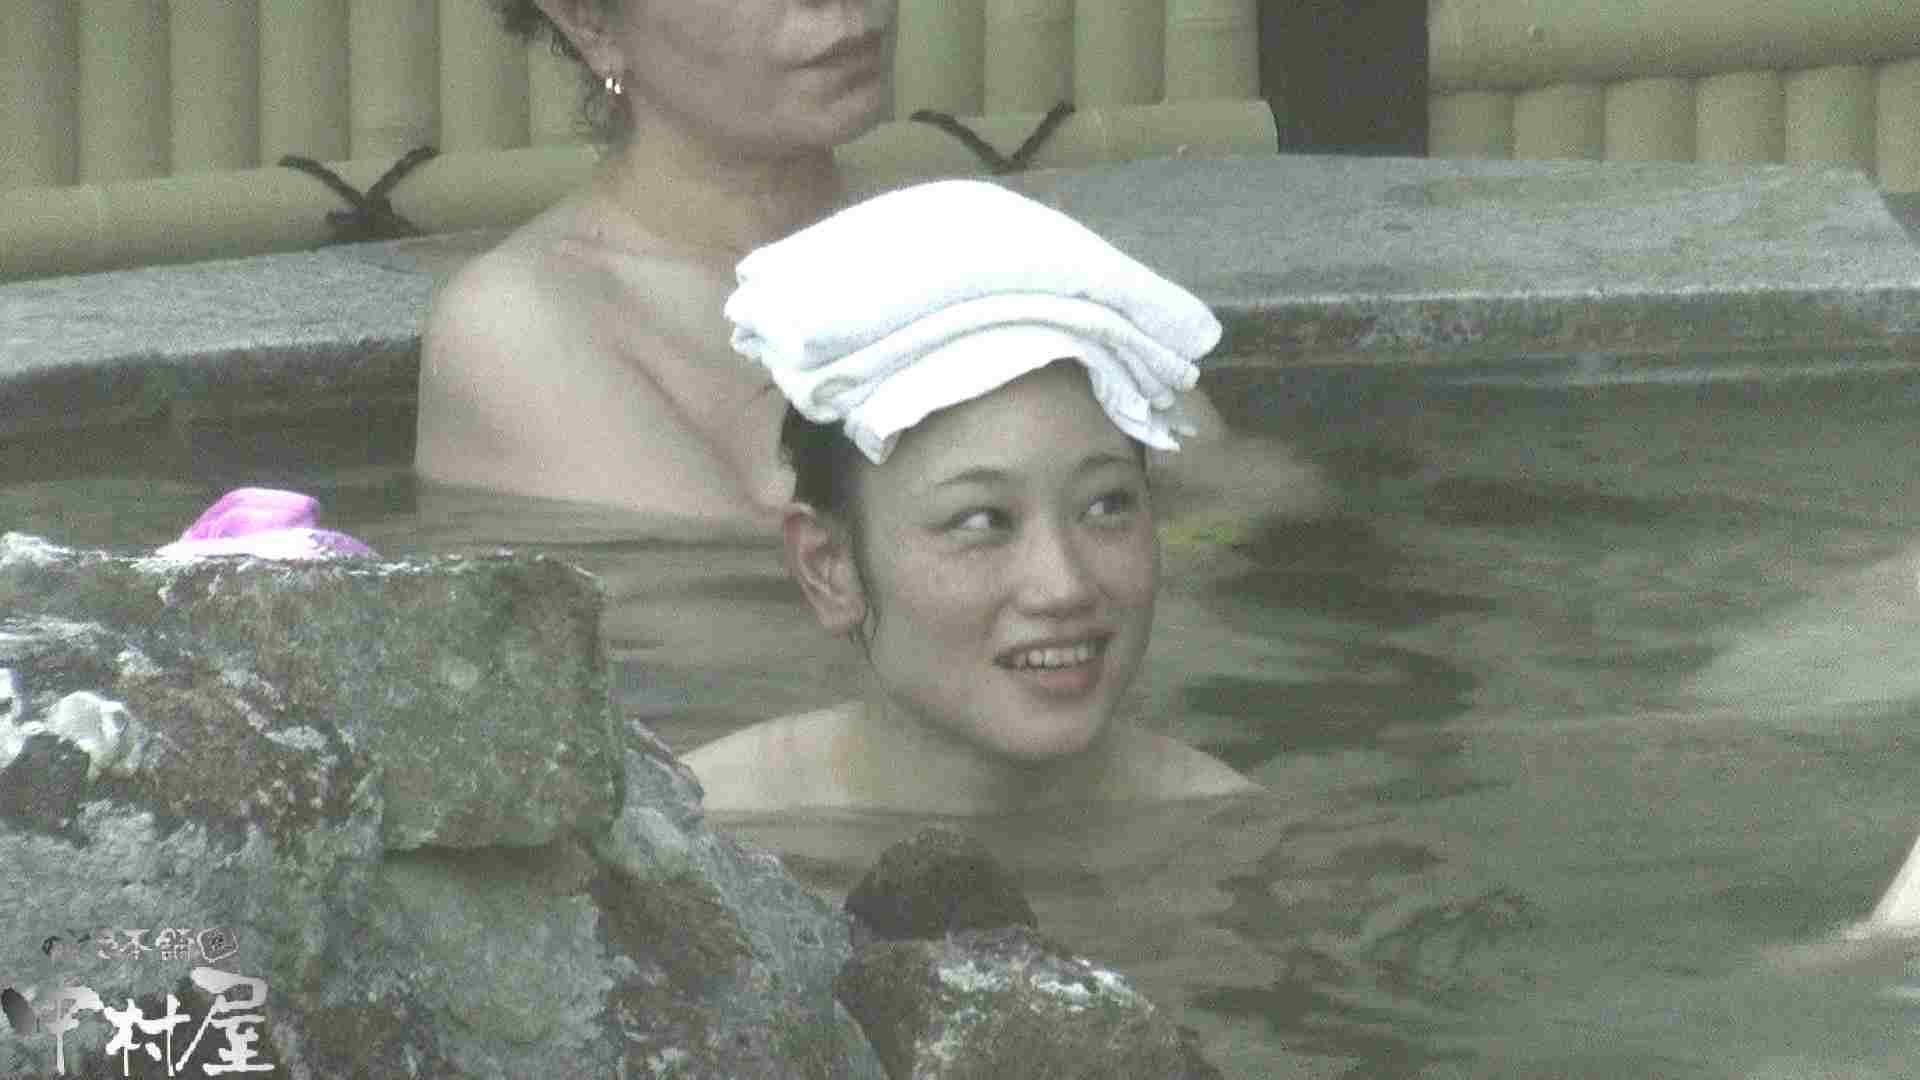 Aquaな露天風呂Vol.914 露天風呂編  83PIX 20